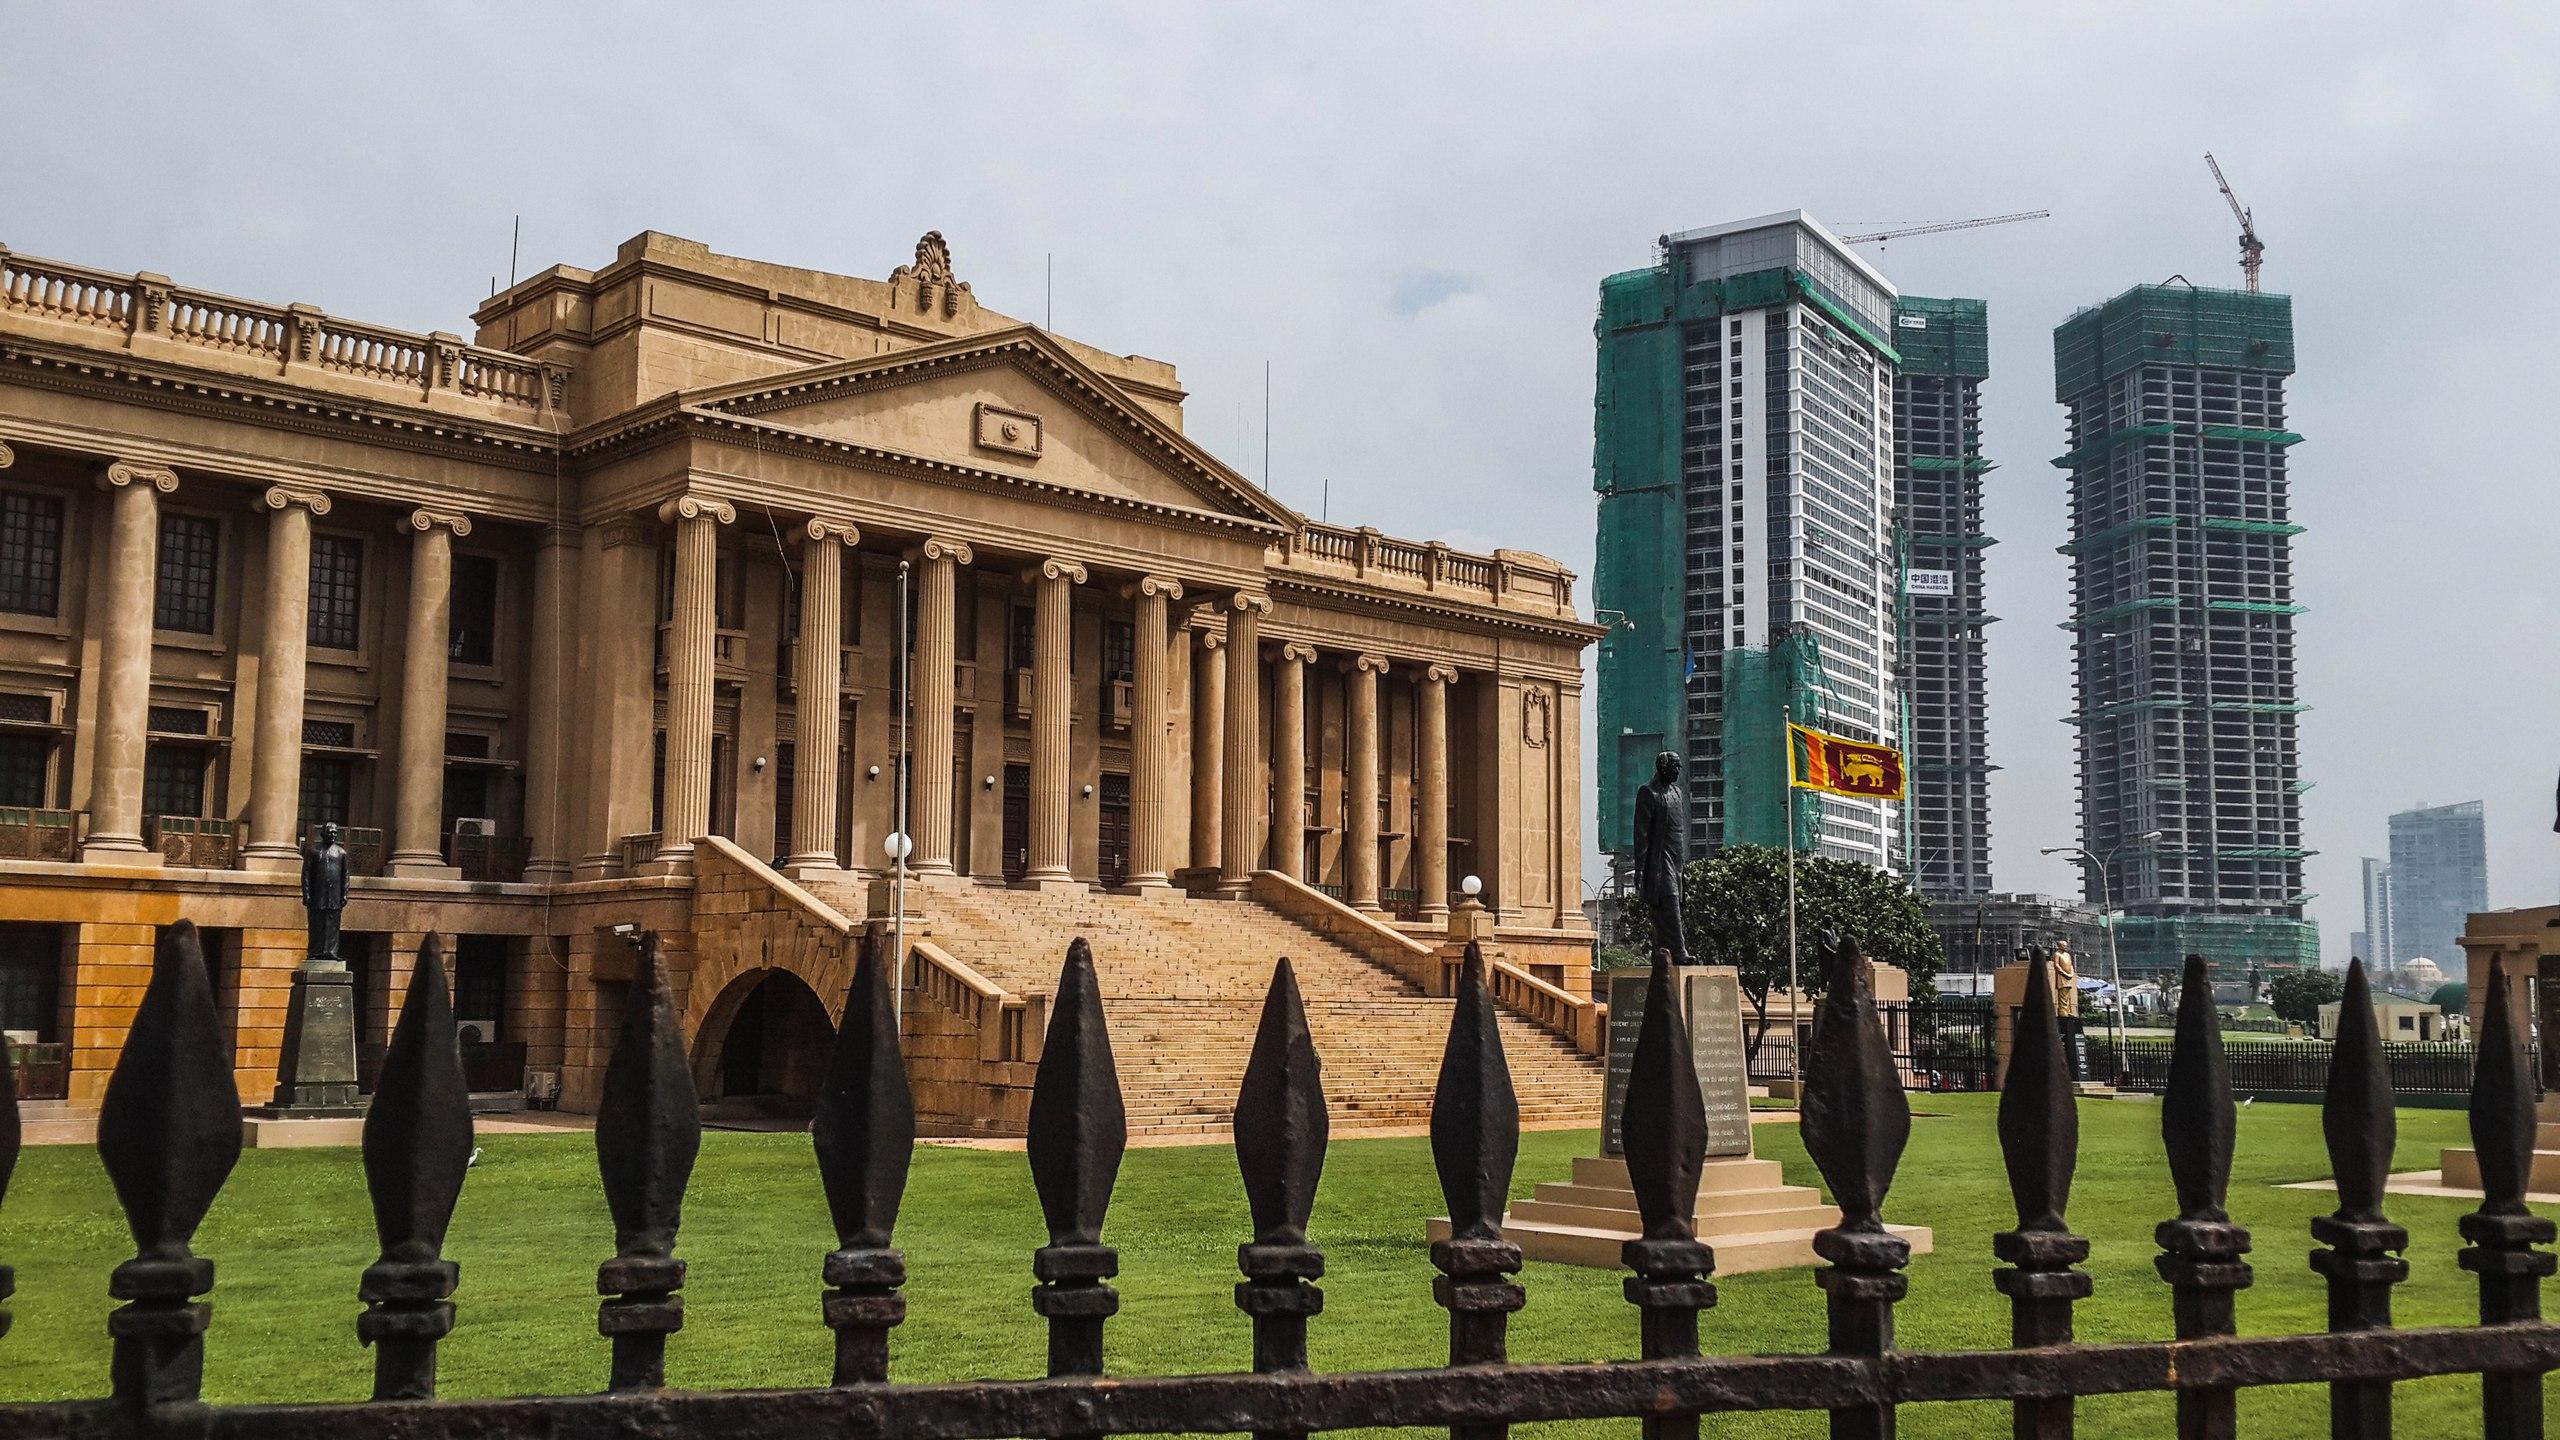 Коломбо, Шри-Ланка, ноябрь 2016